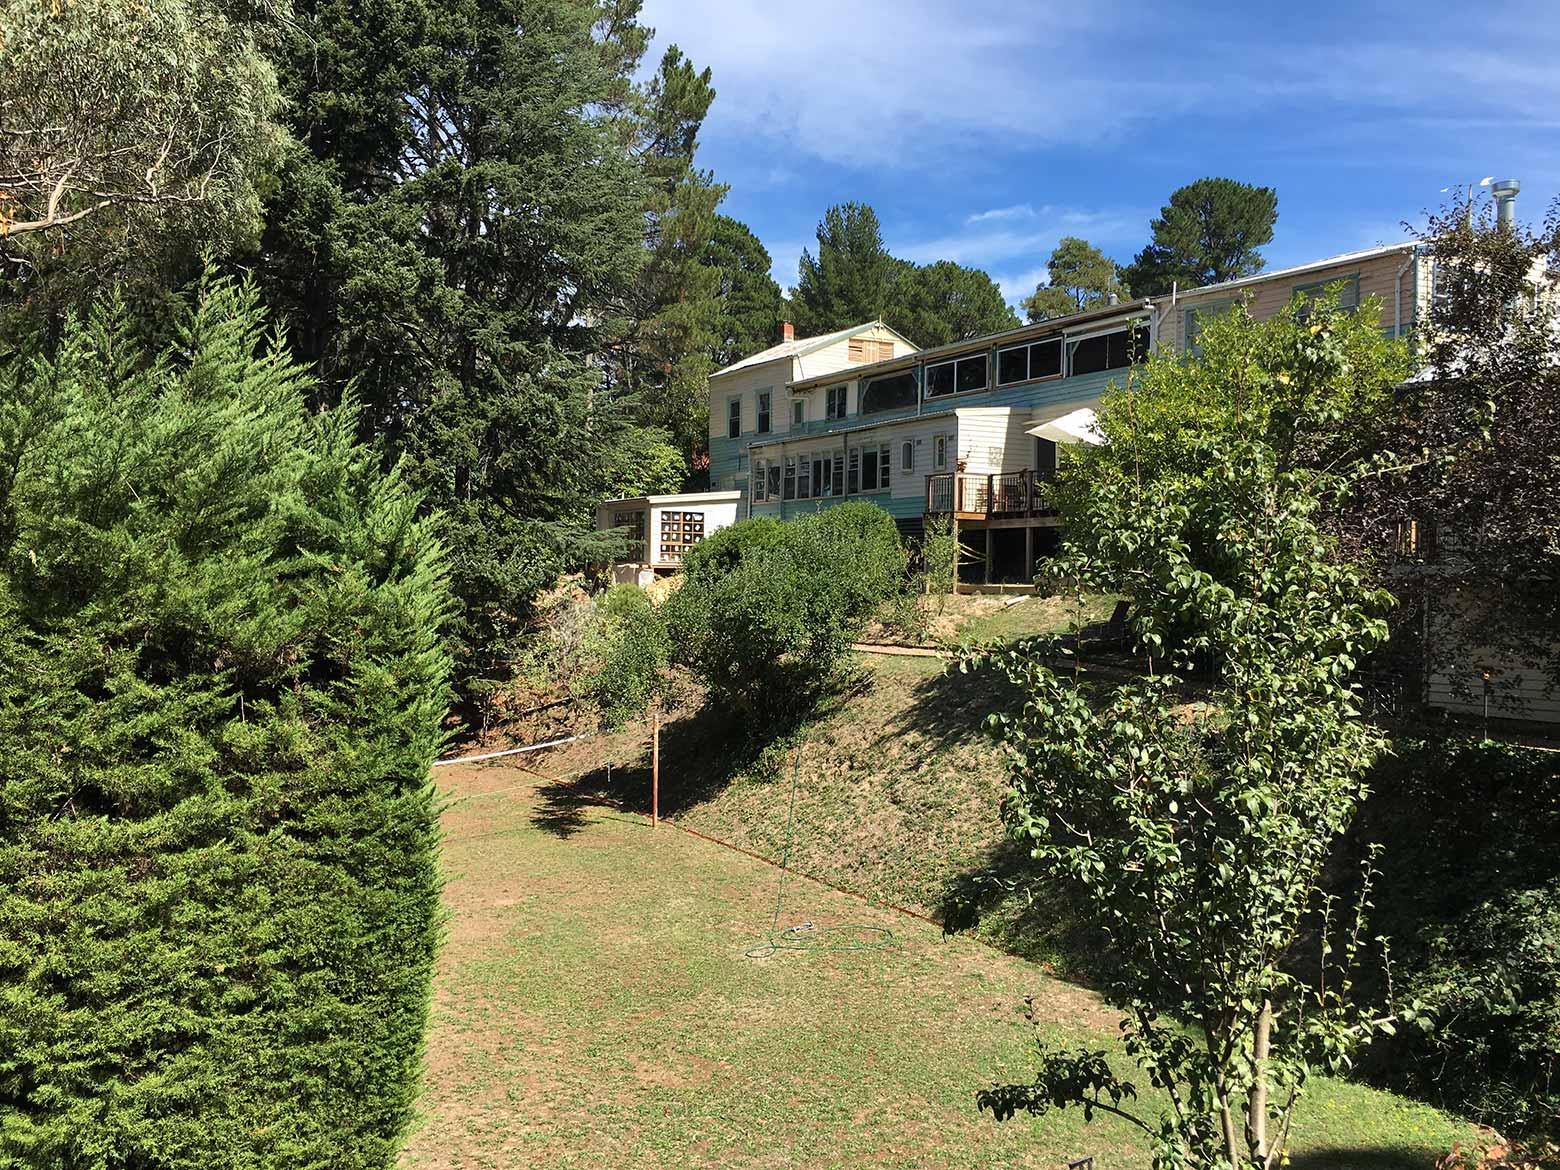 Hepburn-Springs-Daylesford-Continental-House-Yoga-Corner-Retreat-March-2016-House.jpg